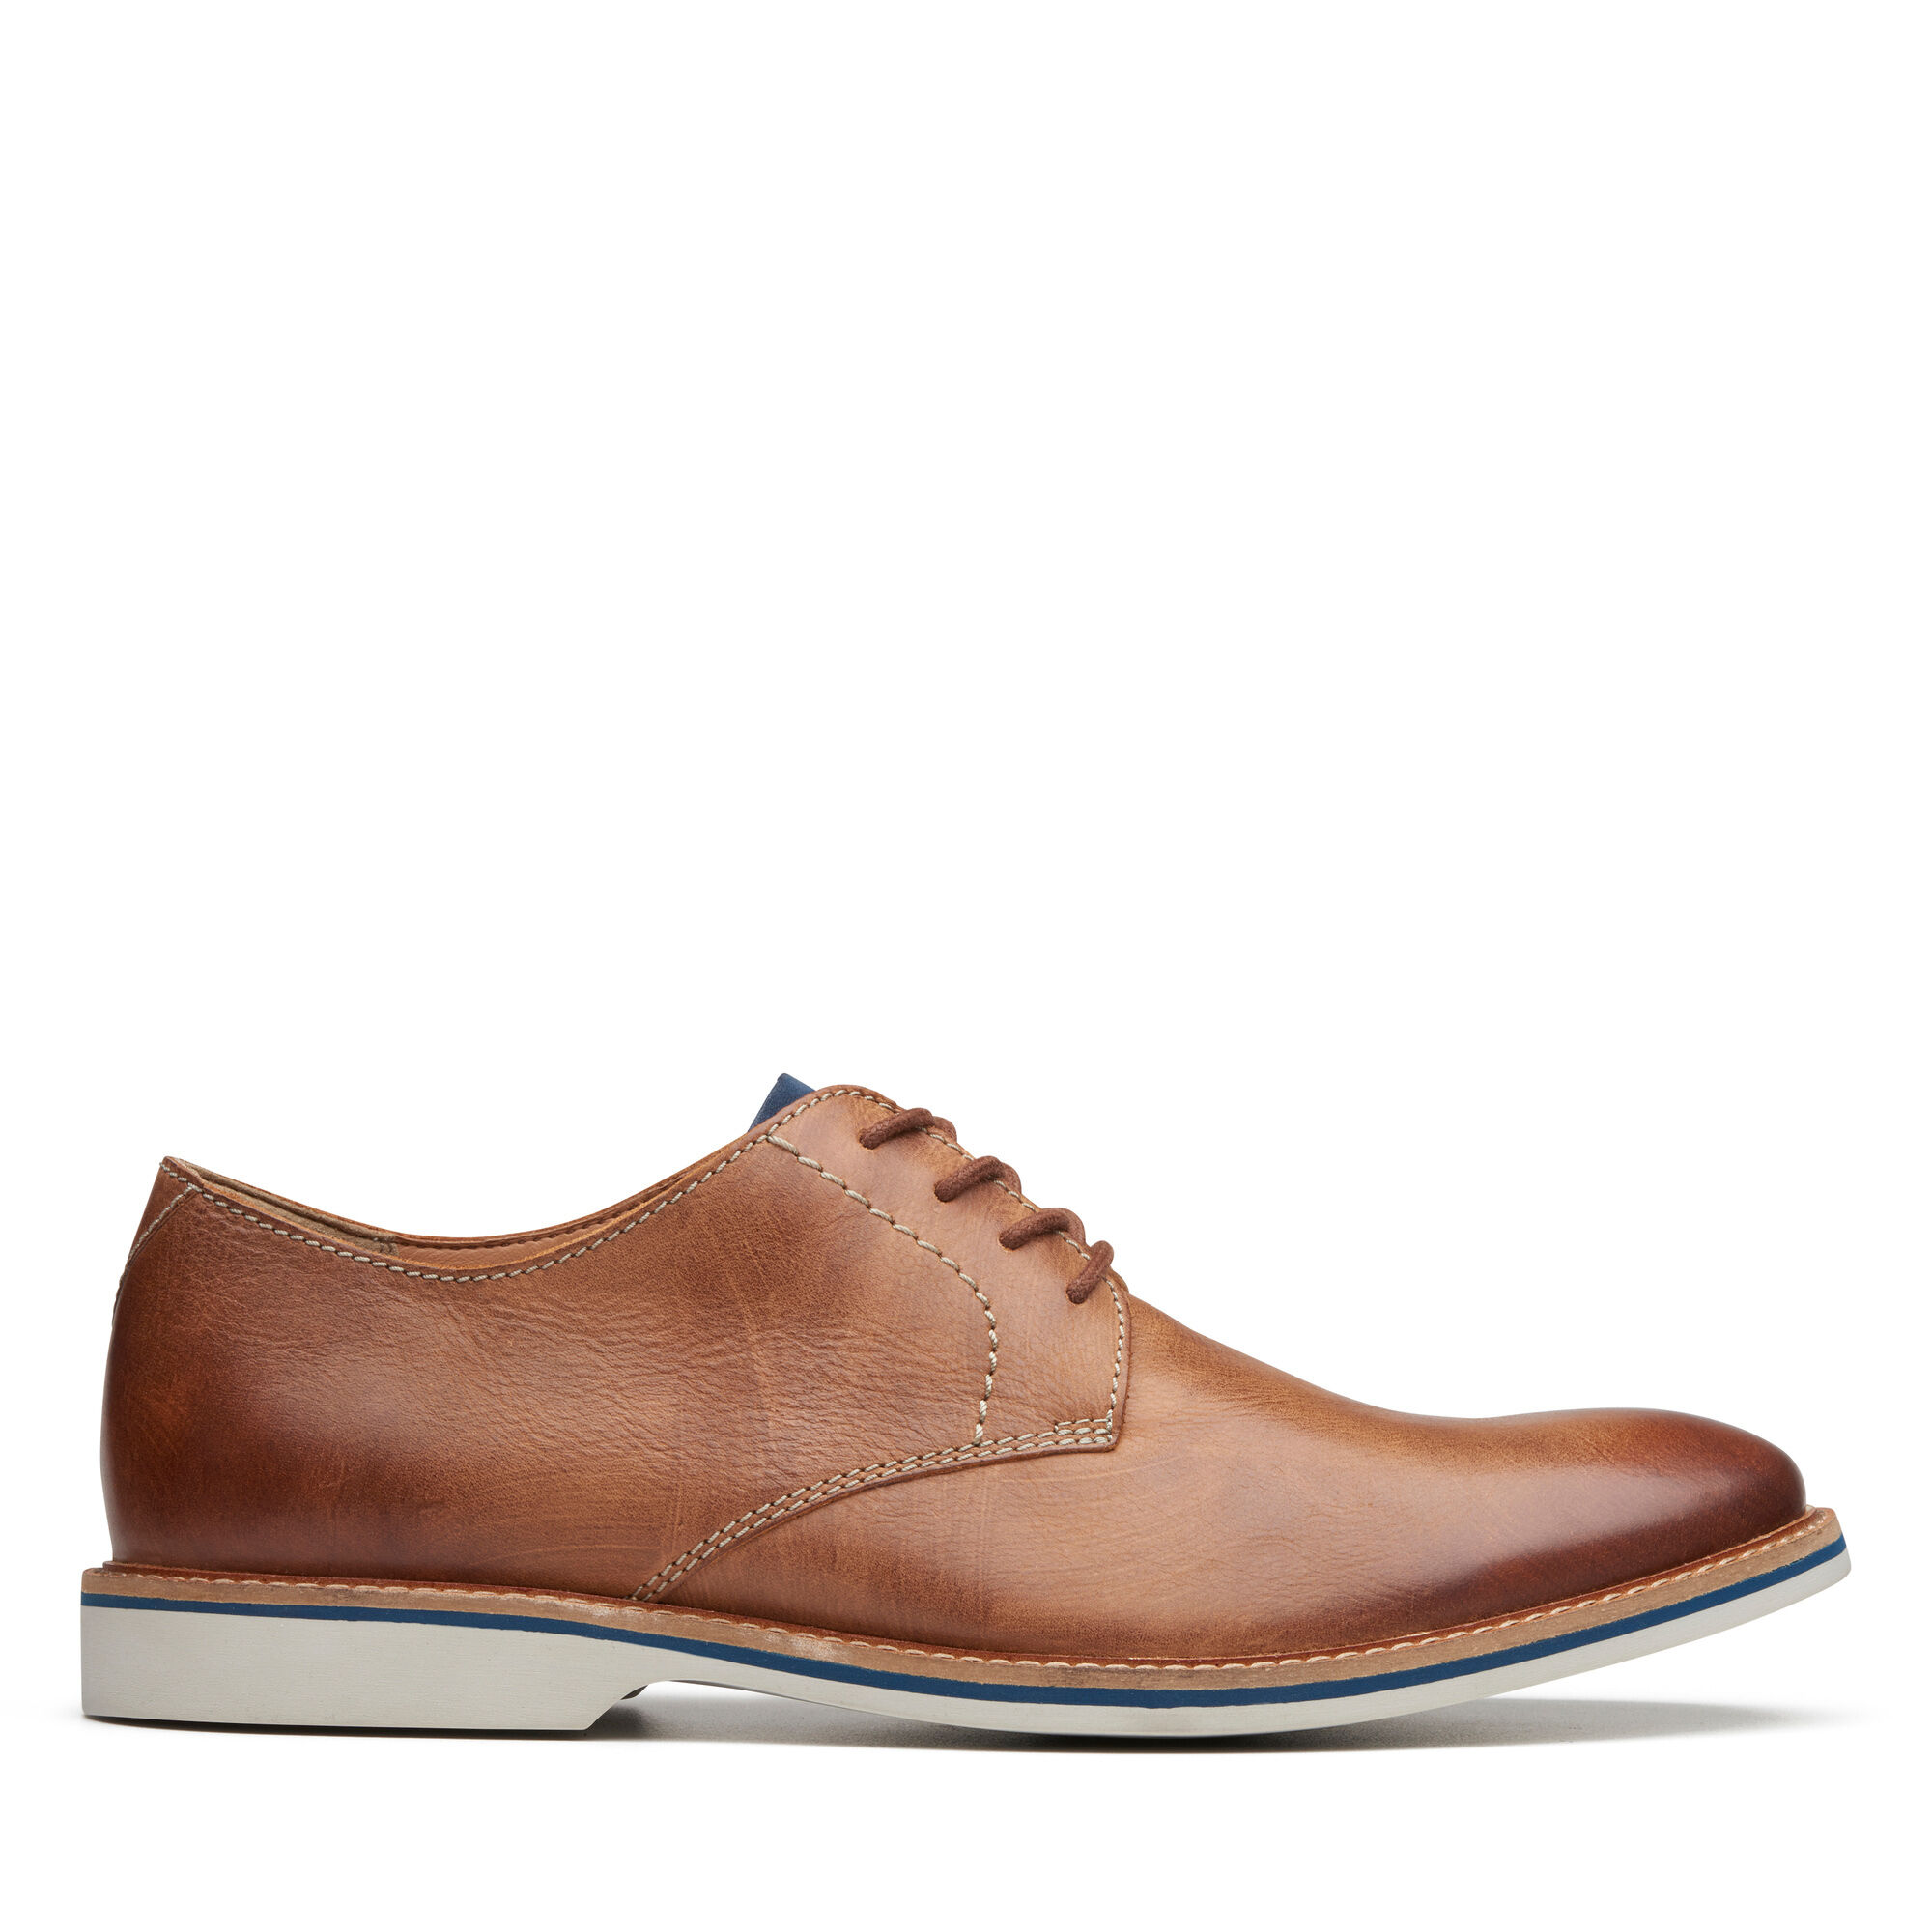 Men's Casual Shoes | Clarks